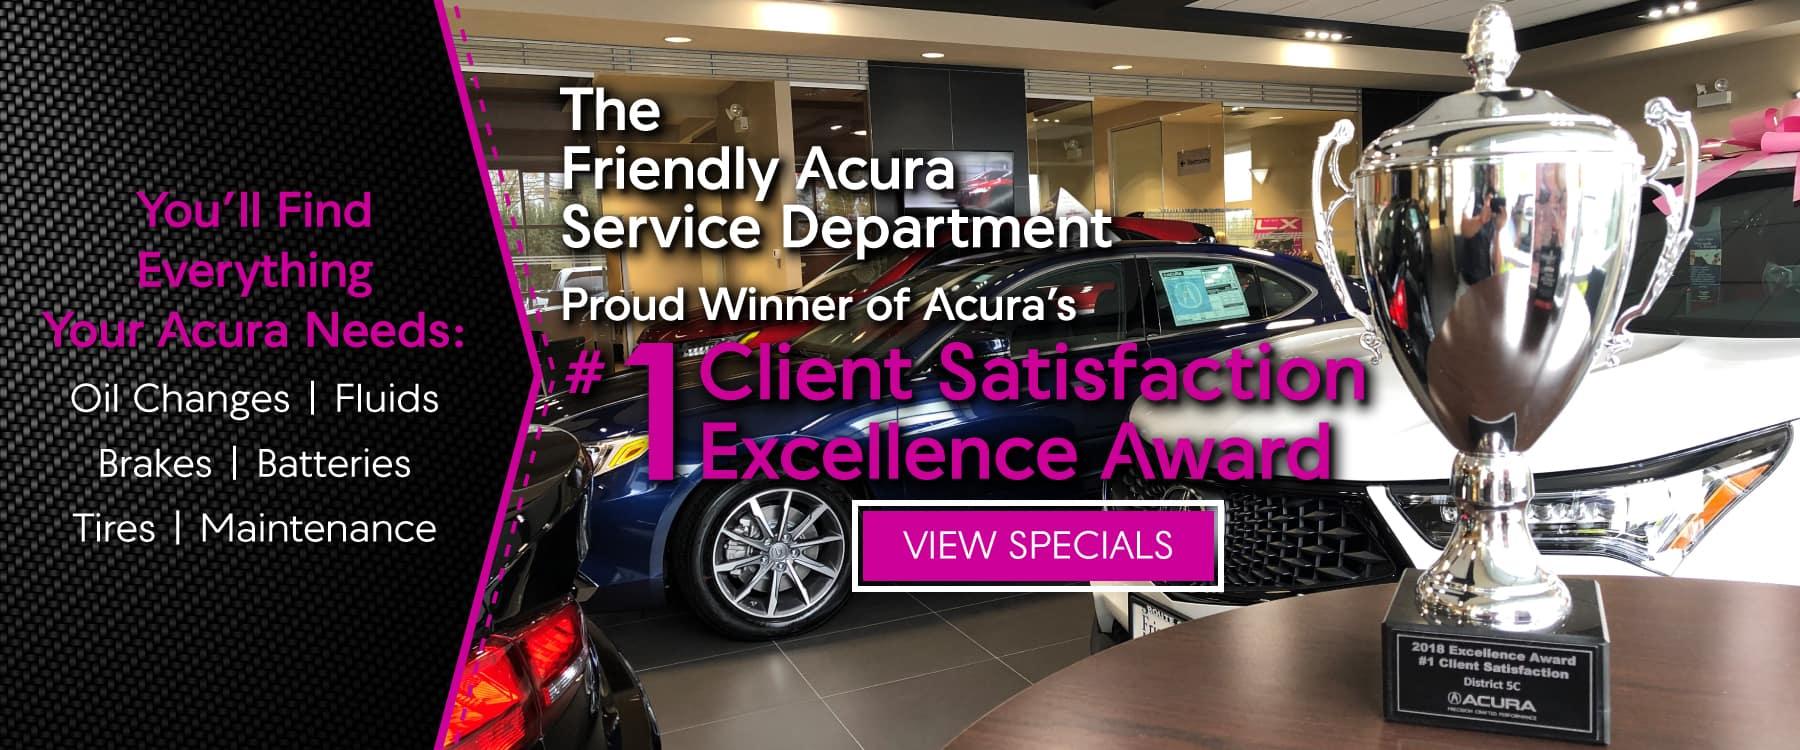 Friendly-Acura-Award-Winning-Service-PINK-rev